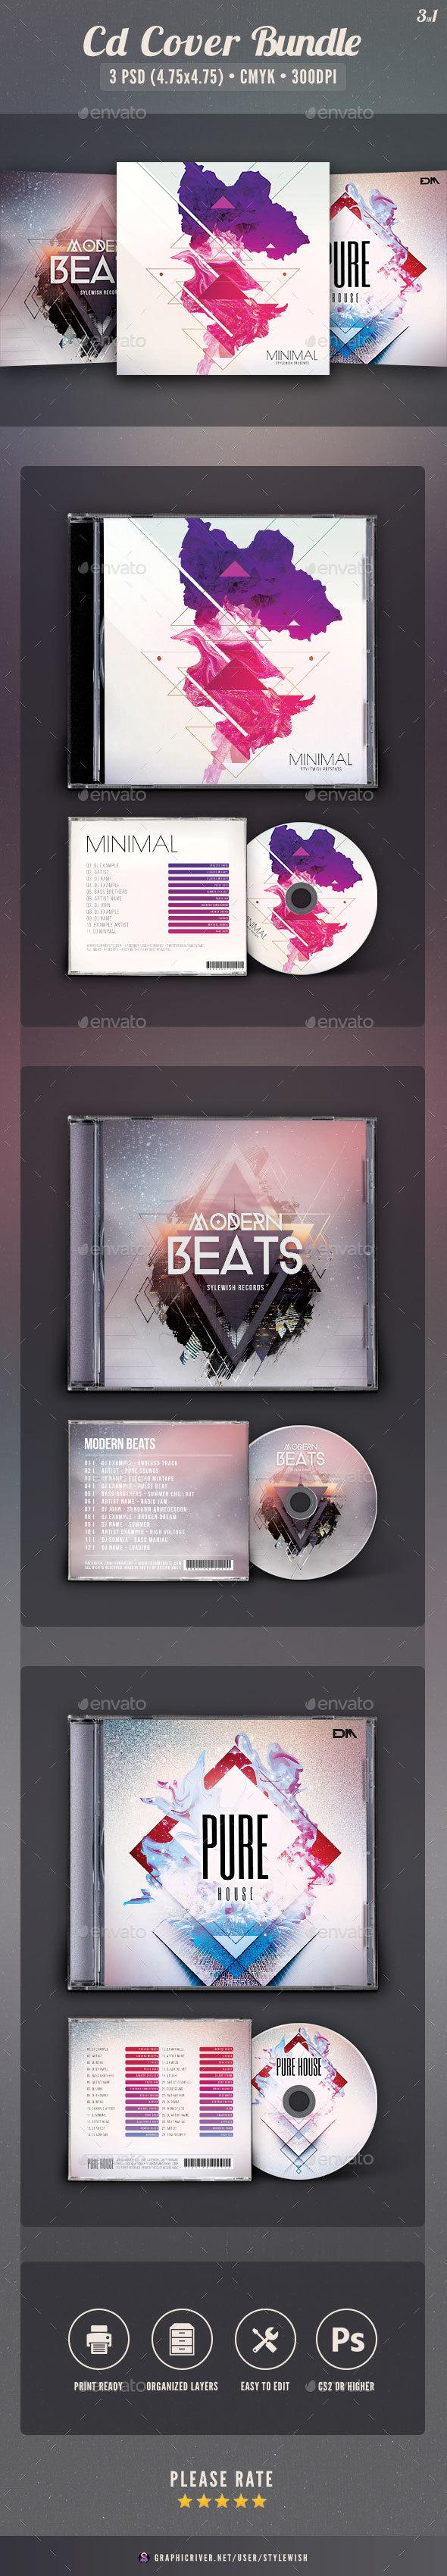 Abstract CD Cover Bundle Vol.02 - CD & DVD Artwork Print Templates